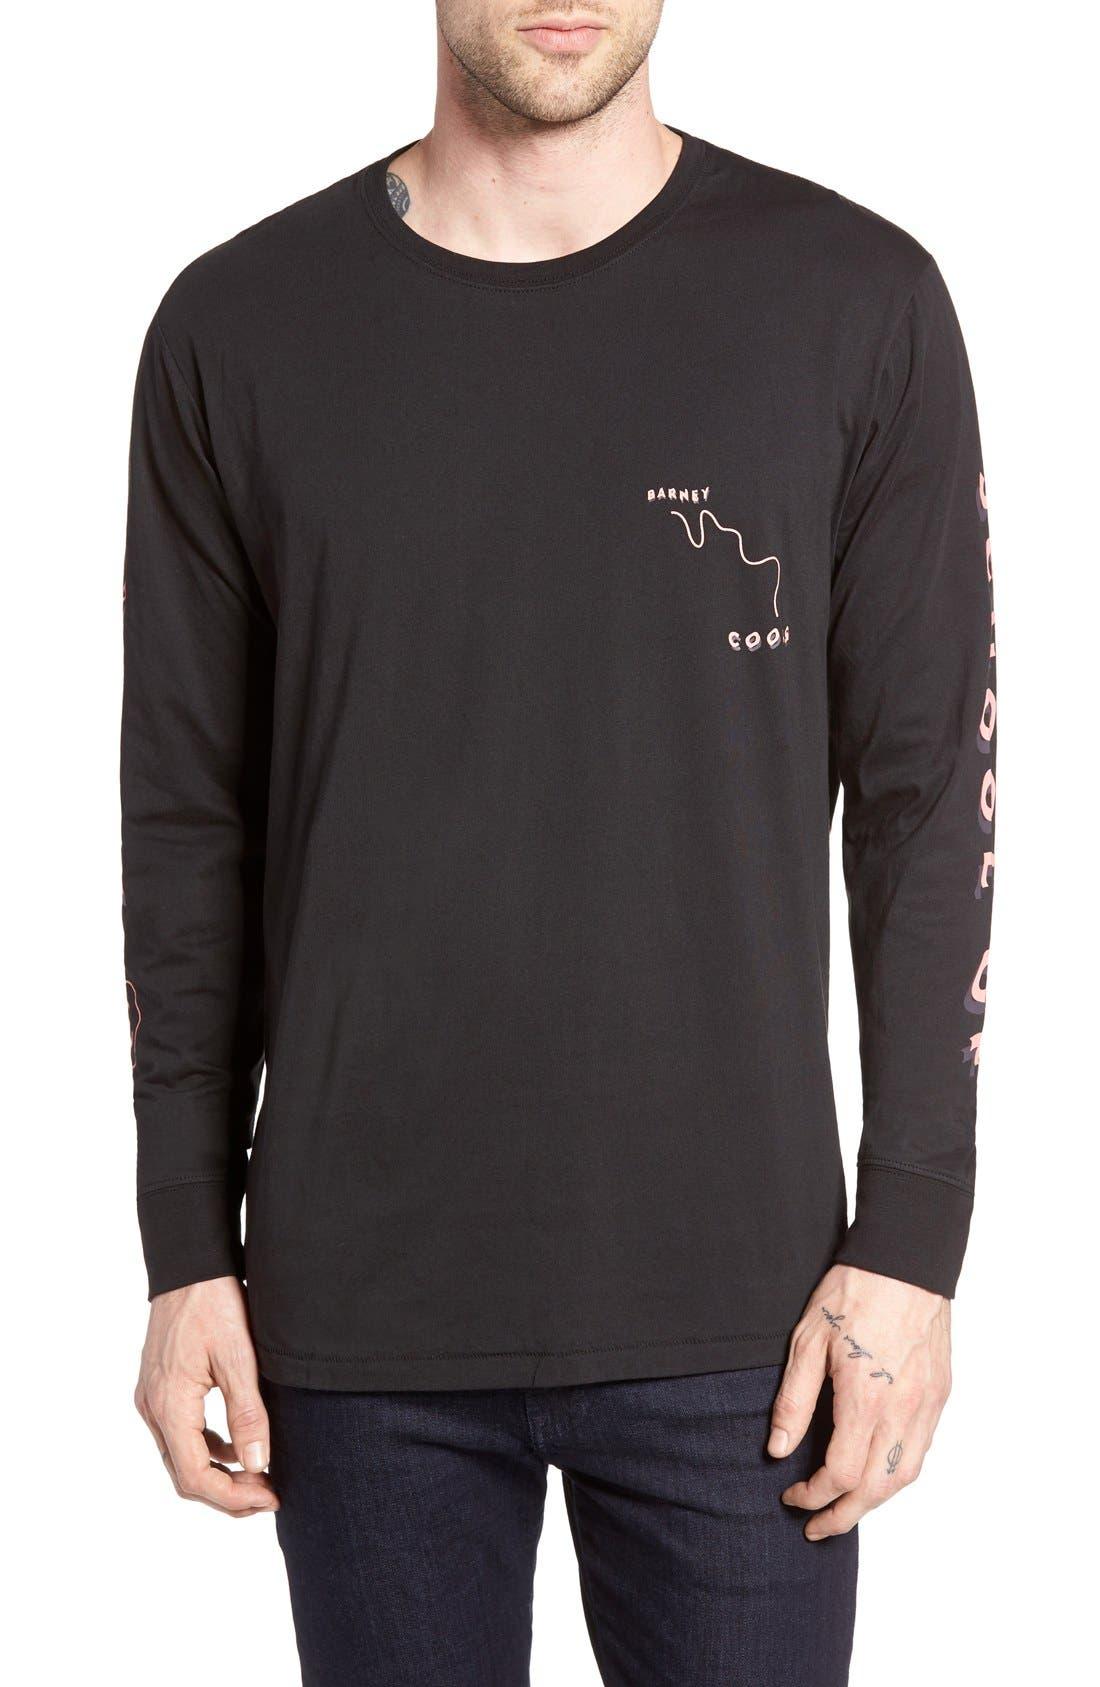 Barney Cools Detention Graphic Crewneck T-Shirt